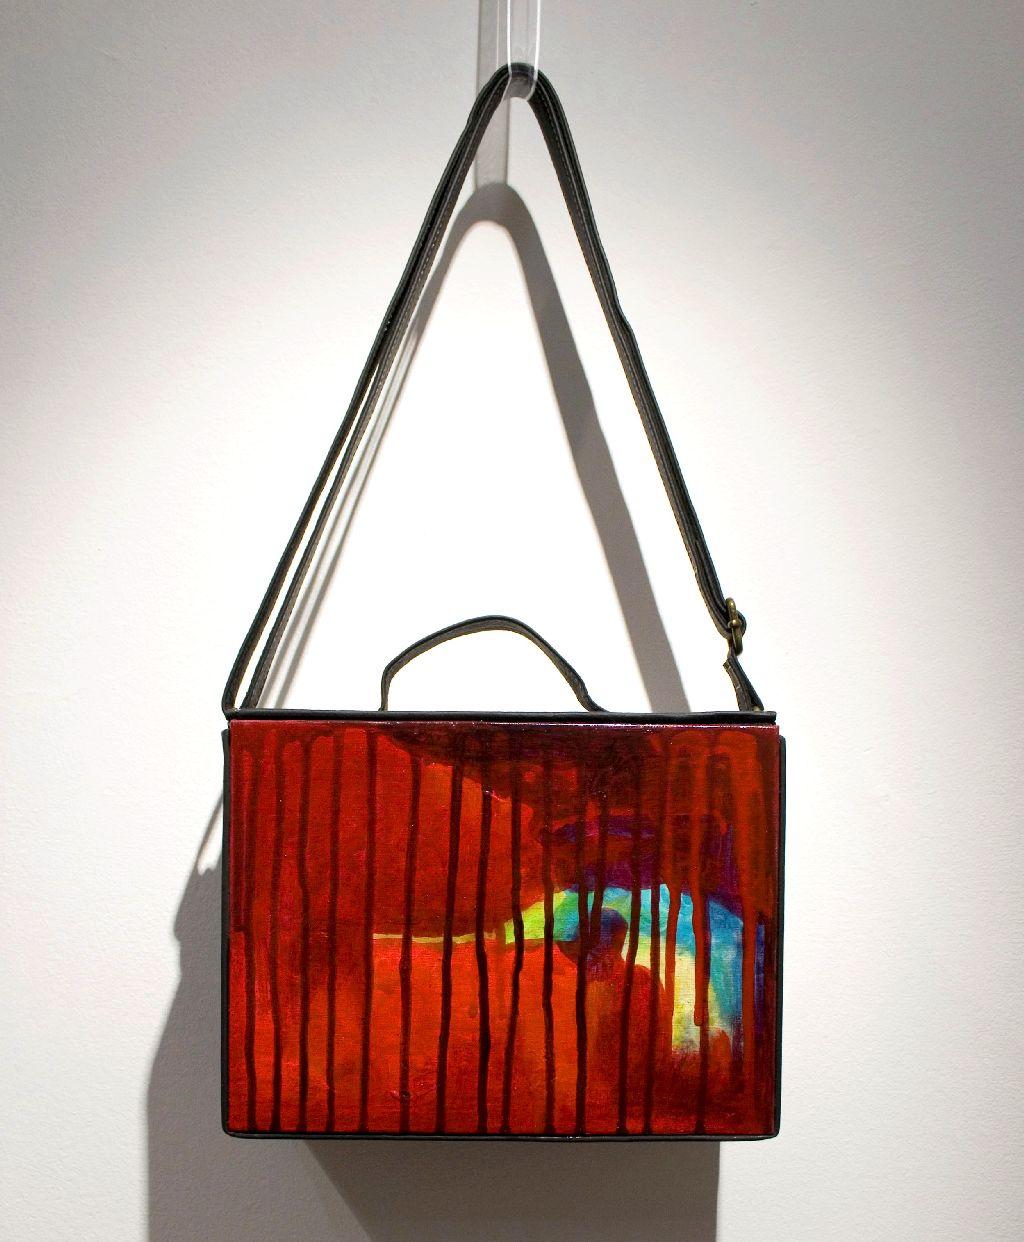 Pictura incastrata in geanta de Elena Vijoli